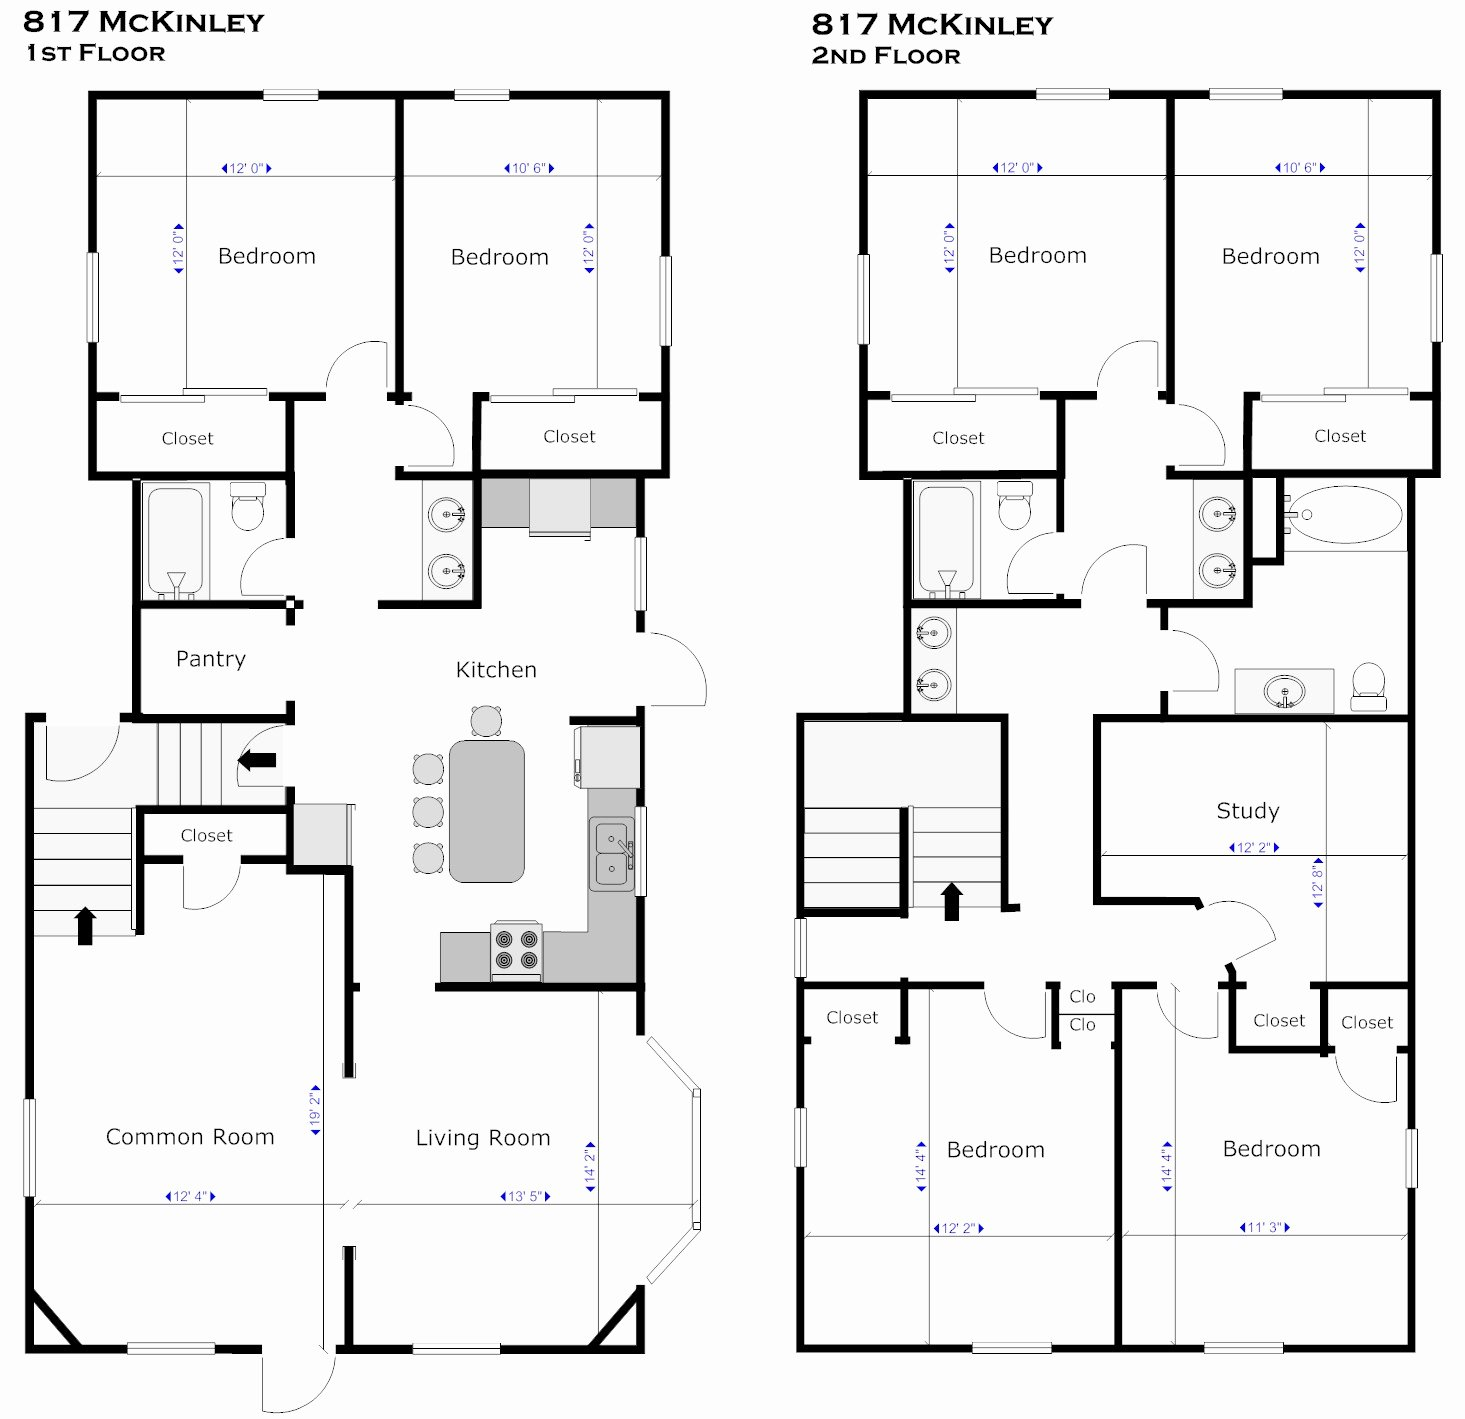 Design Ideas Line Room Design Ideas for Floor Planner